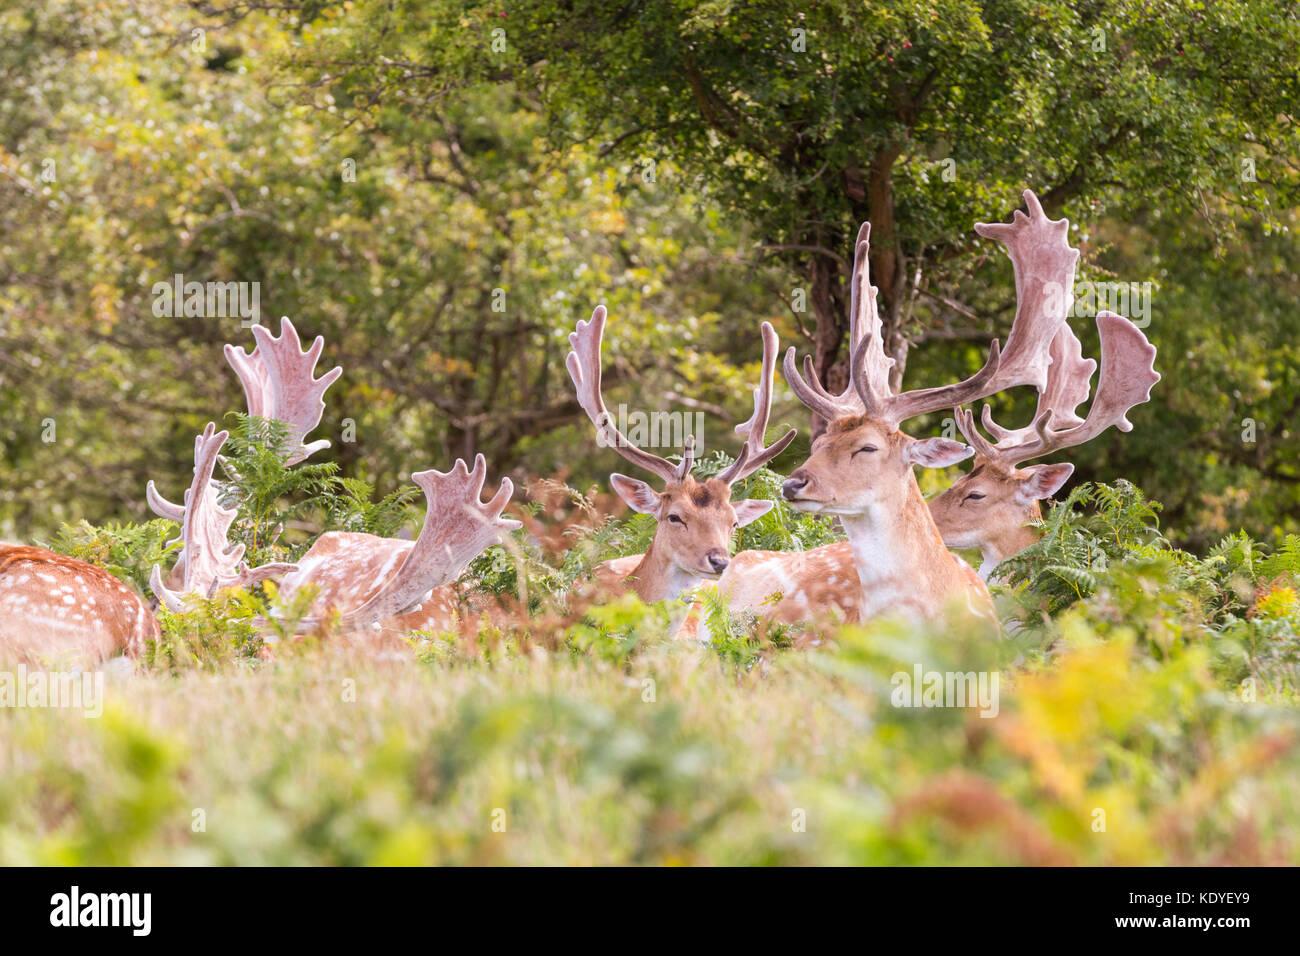 A group of wild male fallow deer bucks (dama dama) laze in the sunshine - Stock Image